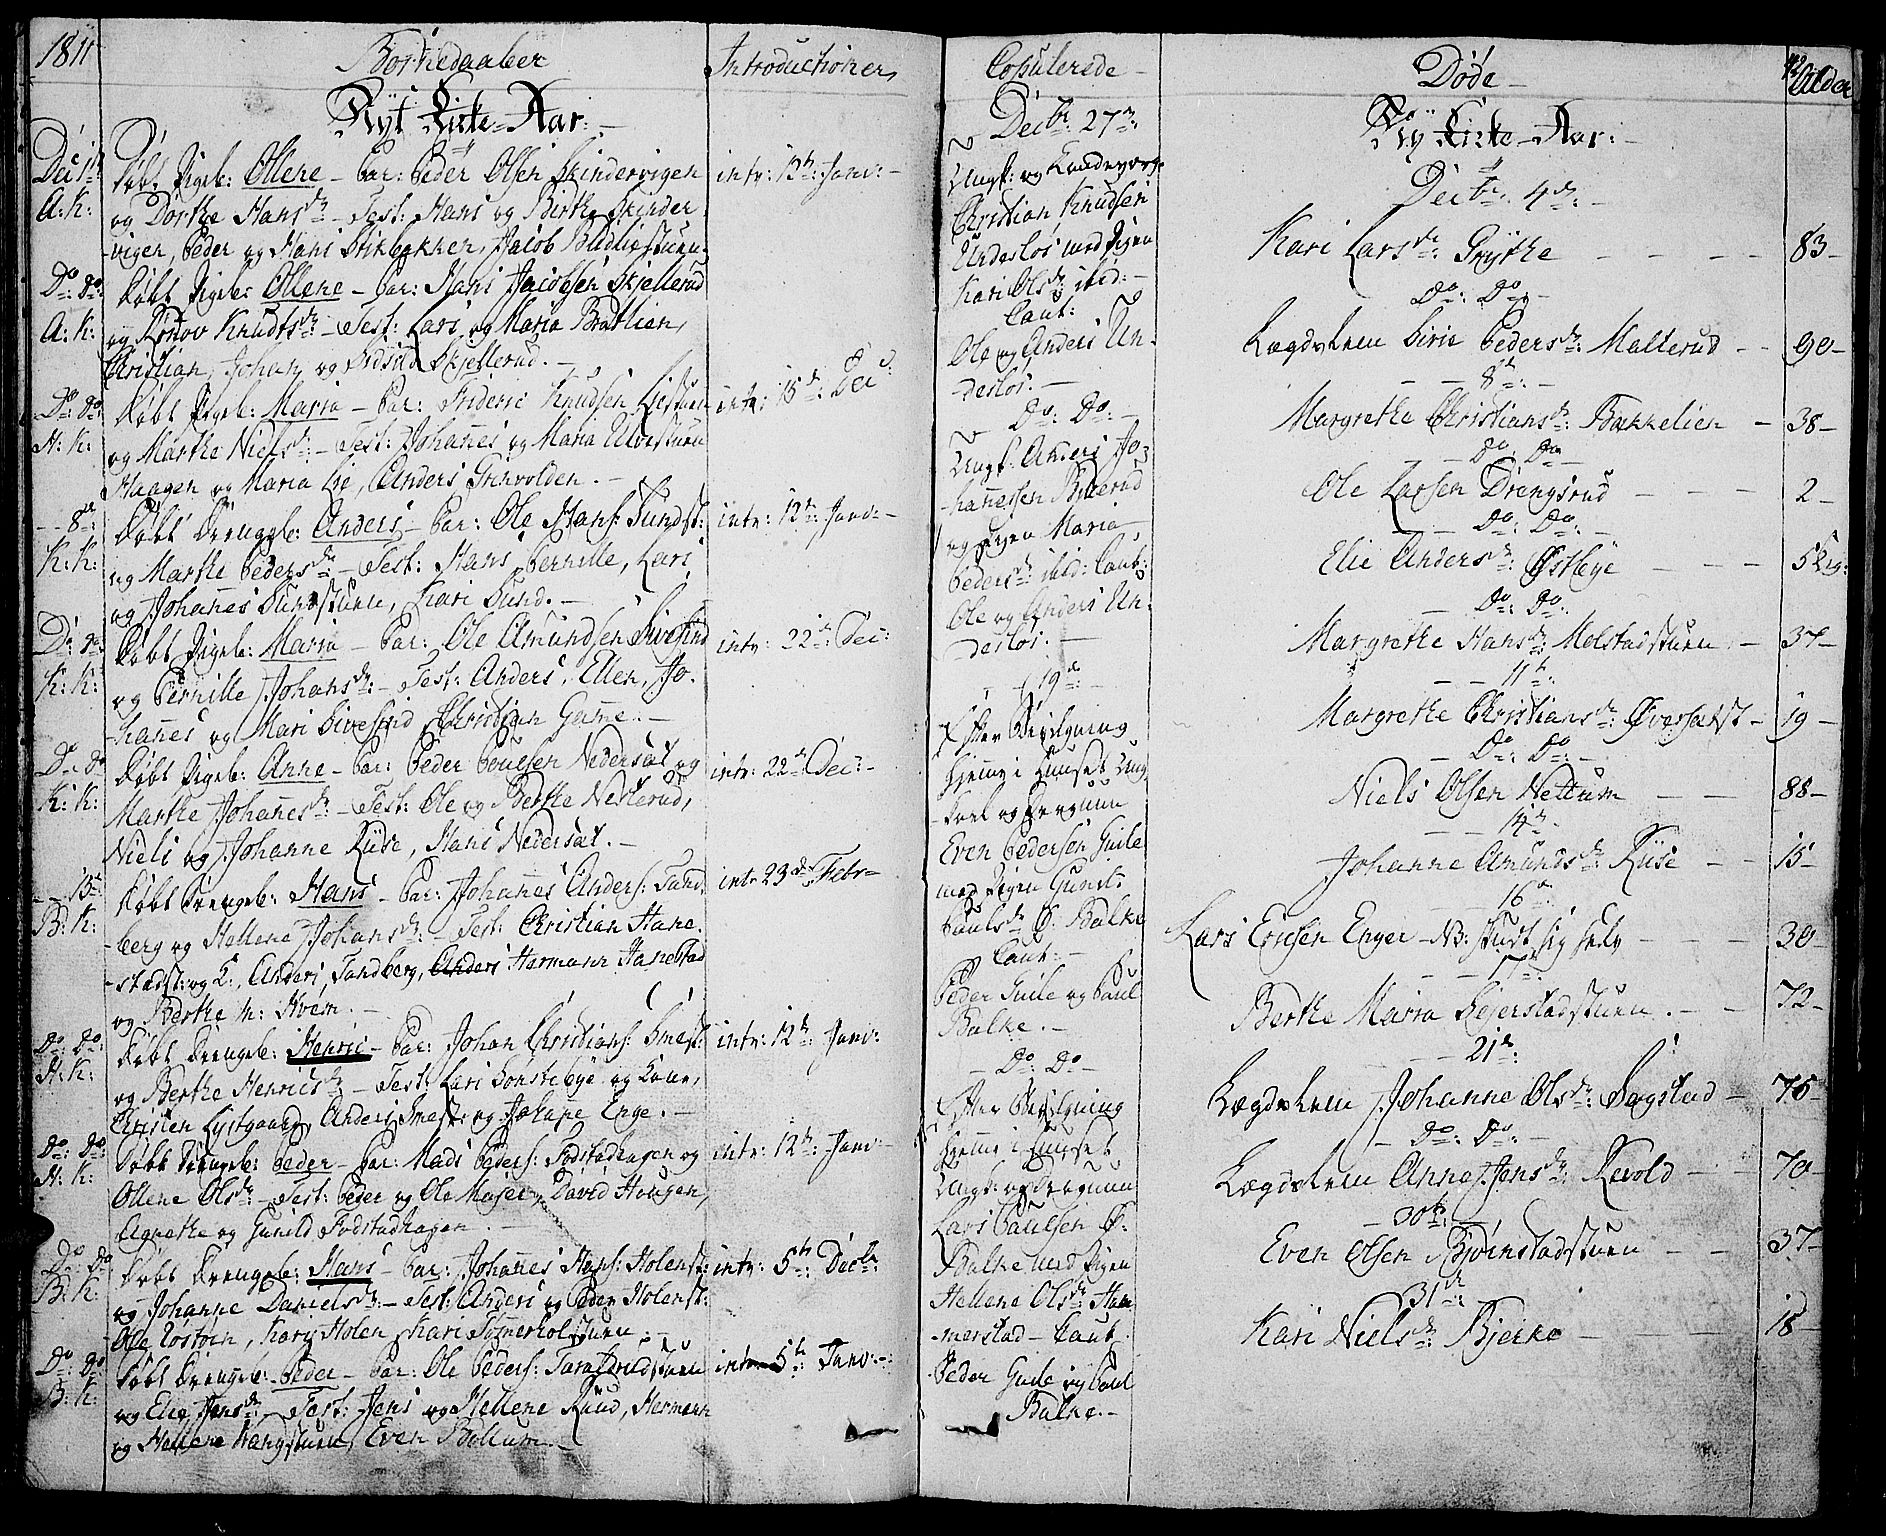 SAH, Toten prestekontor, Ministerialbok nr. 8, 1809-1814, s. 42